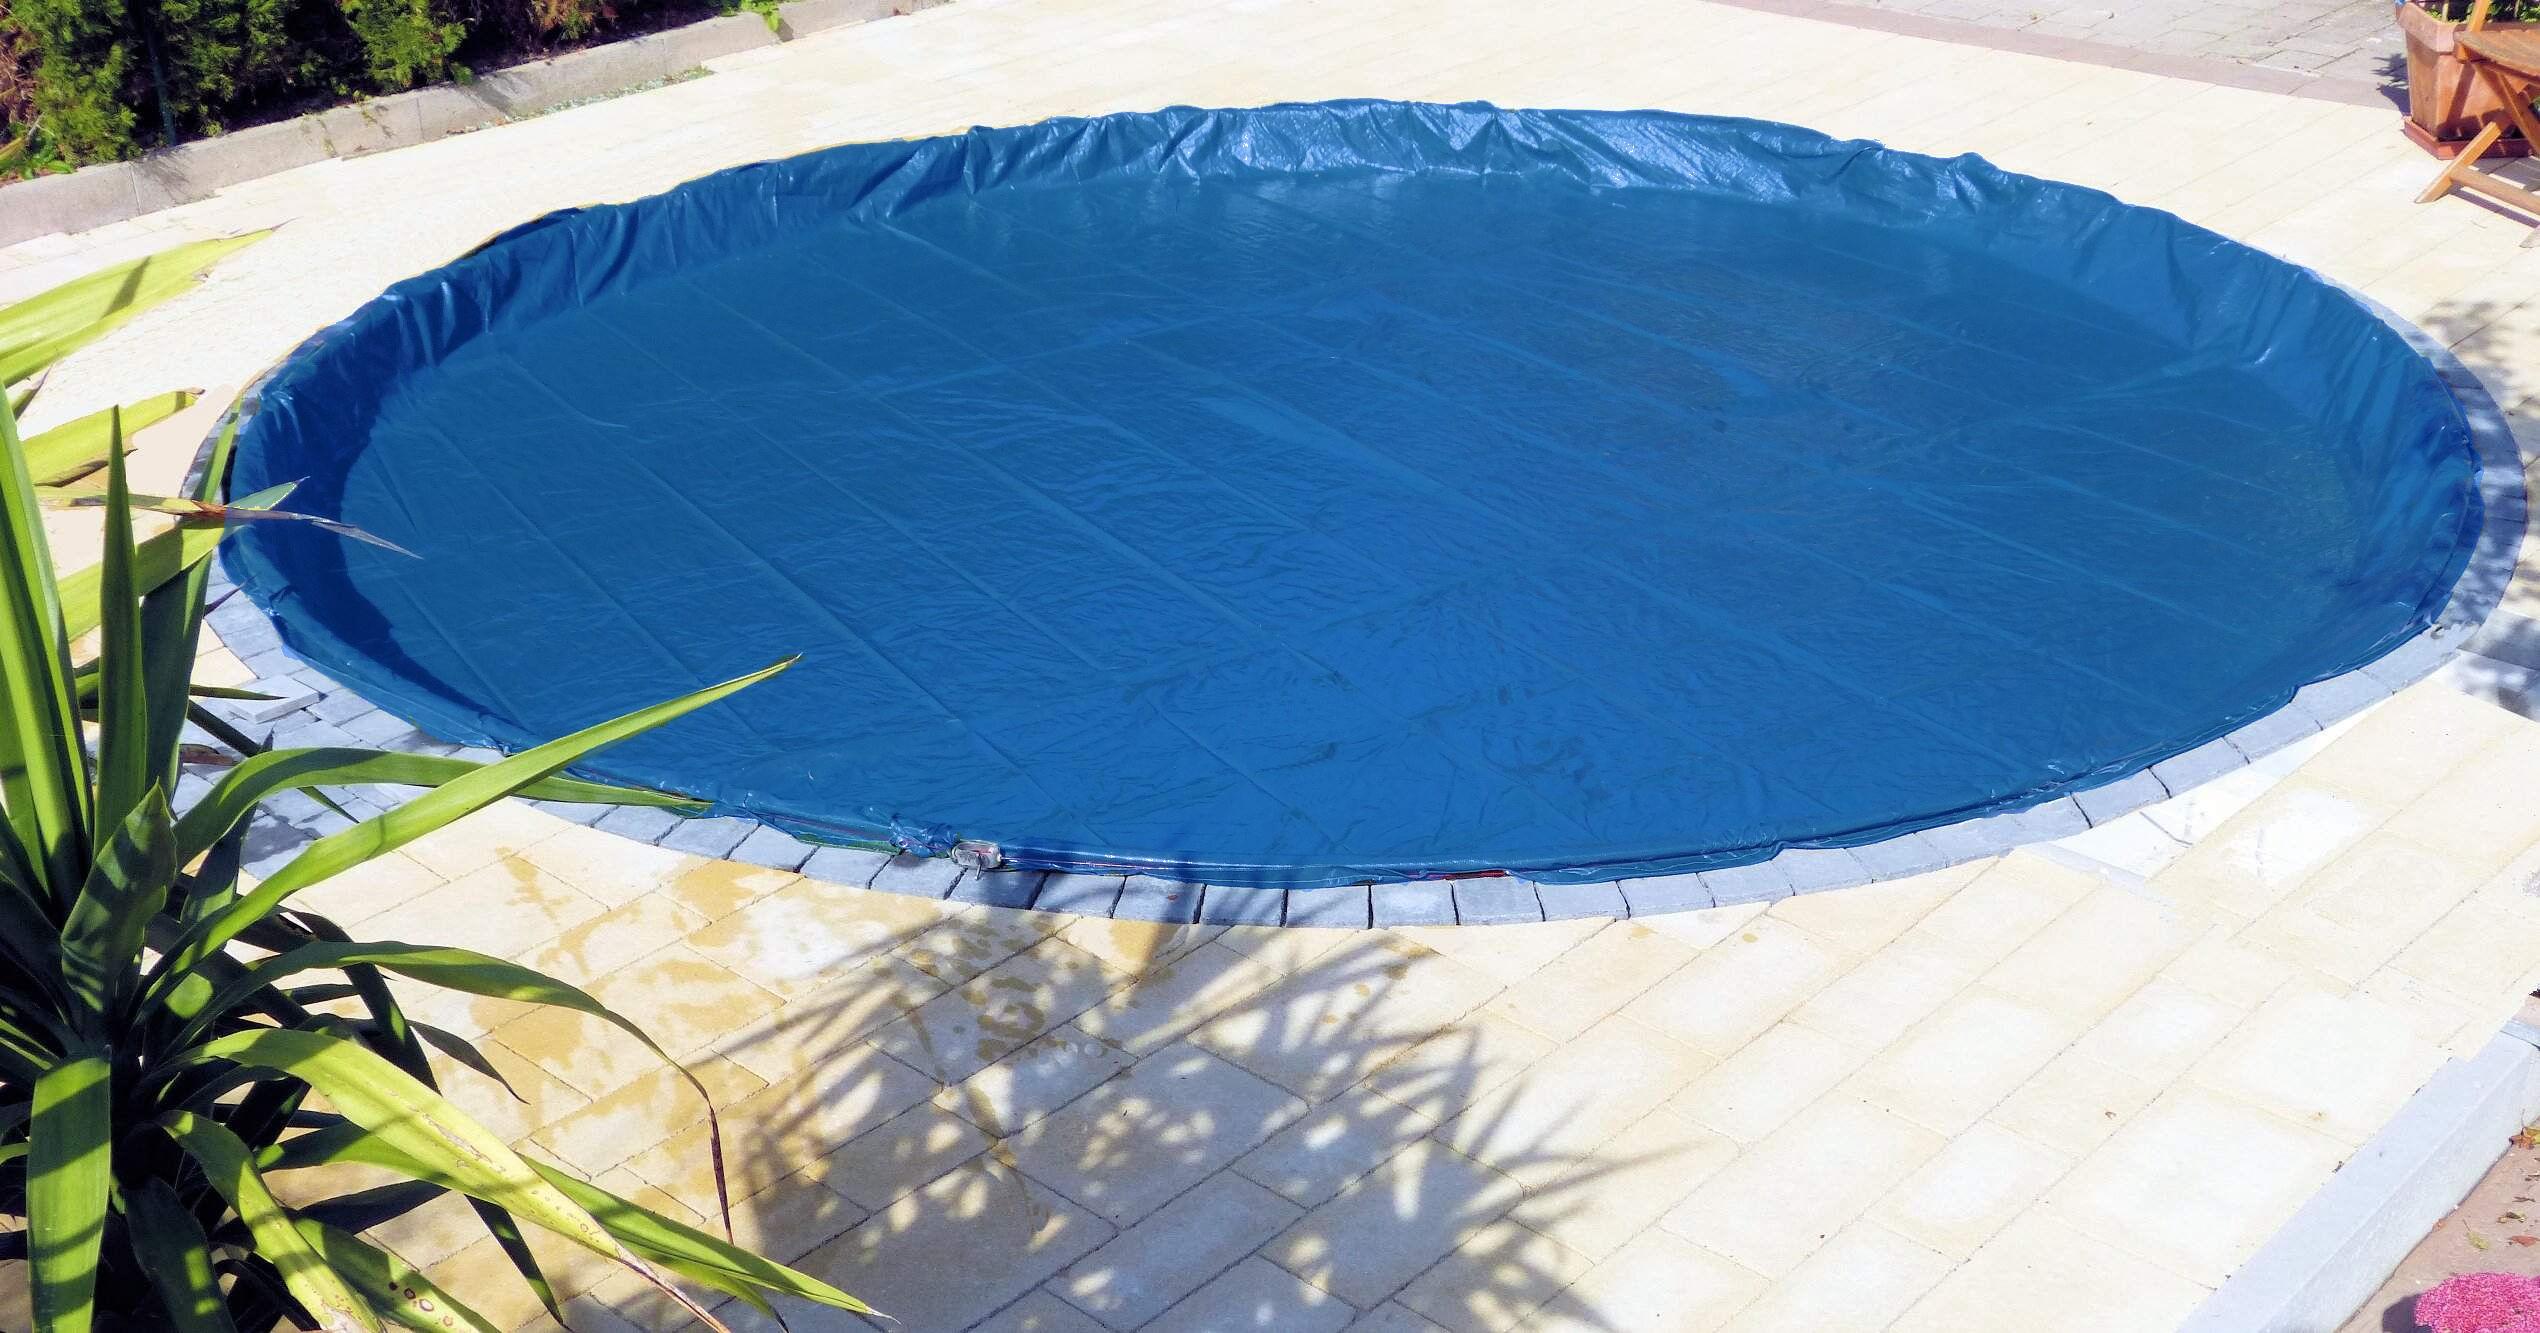 poolkissen 4 x luftkissen abdeckplane blau pool 3 66 m. Black Bedroom Furniture Sets. Home Design Ideas